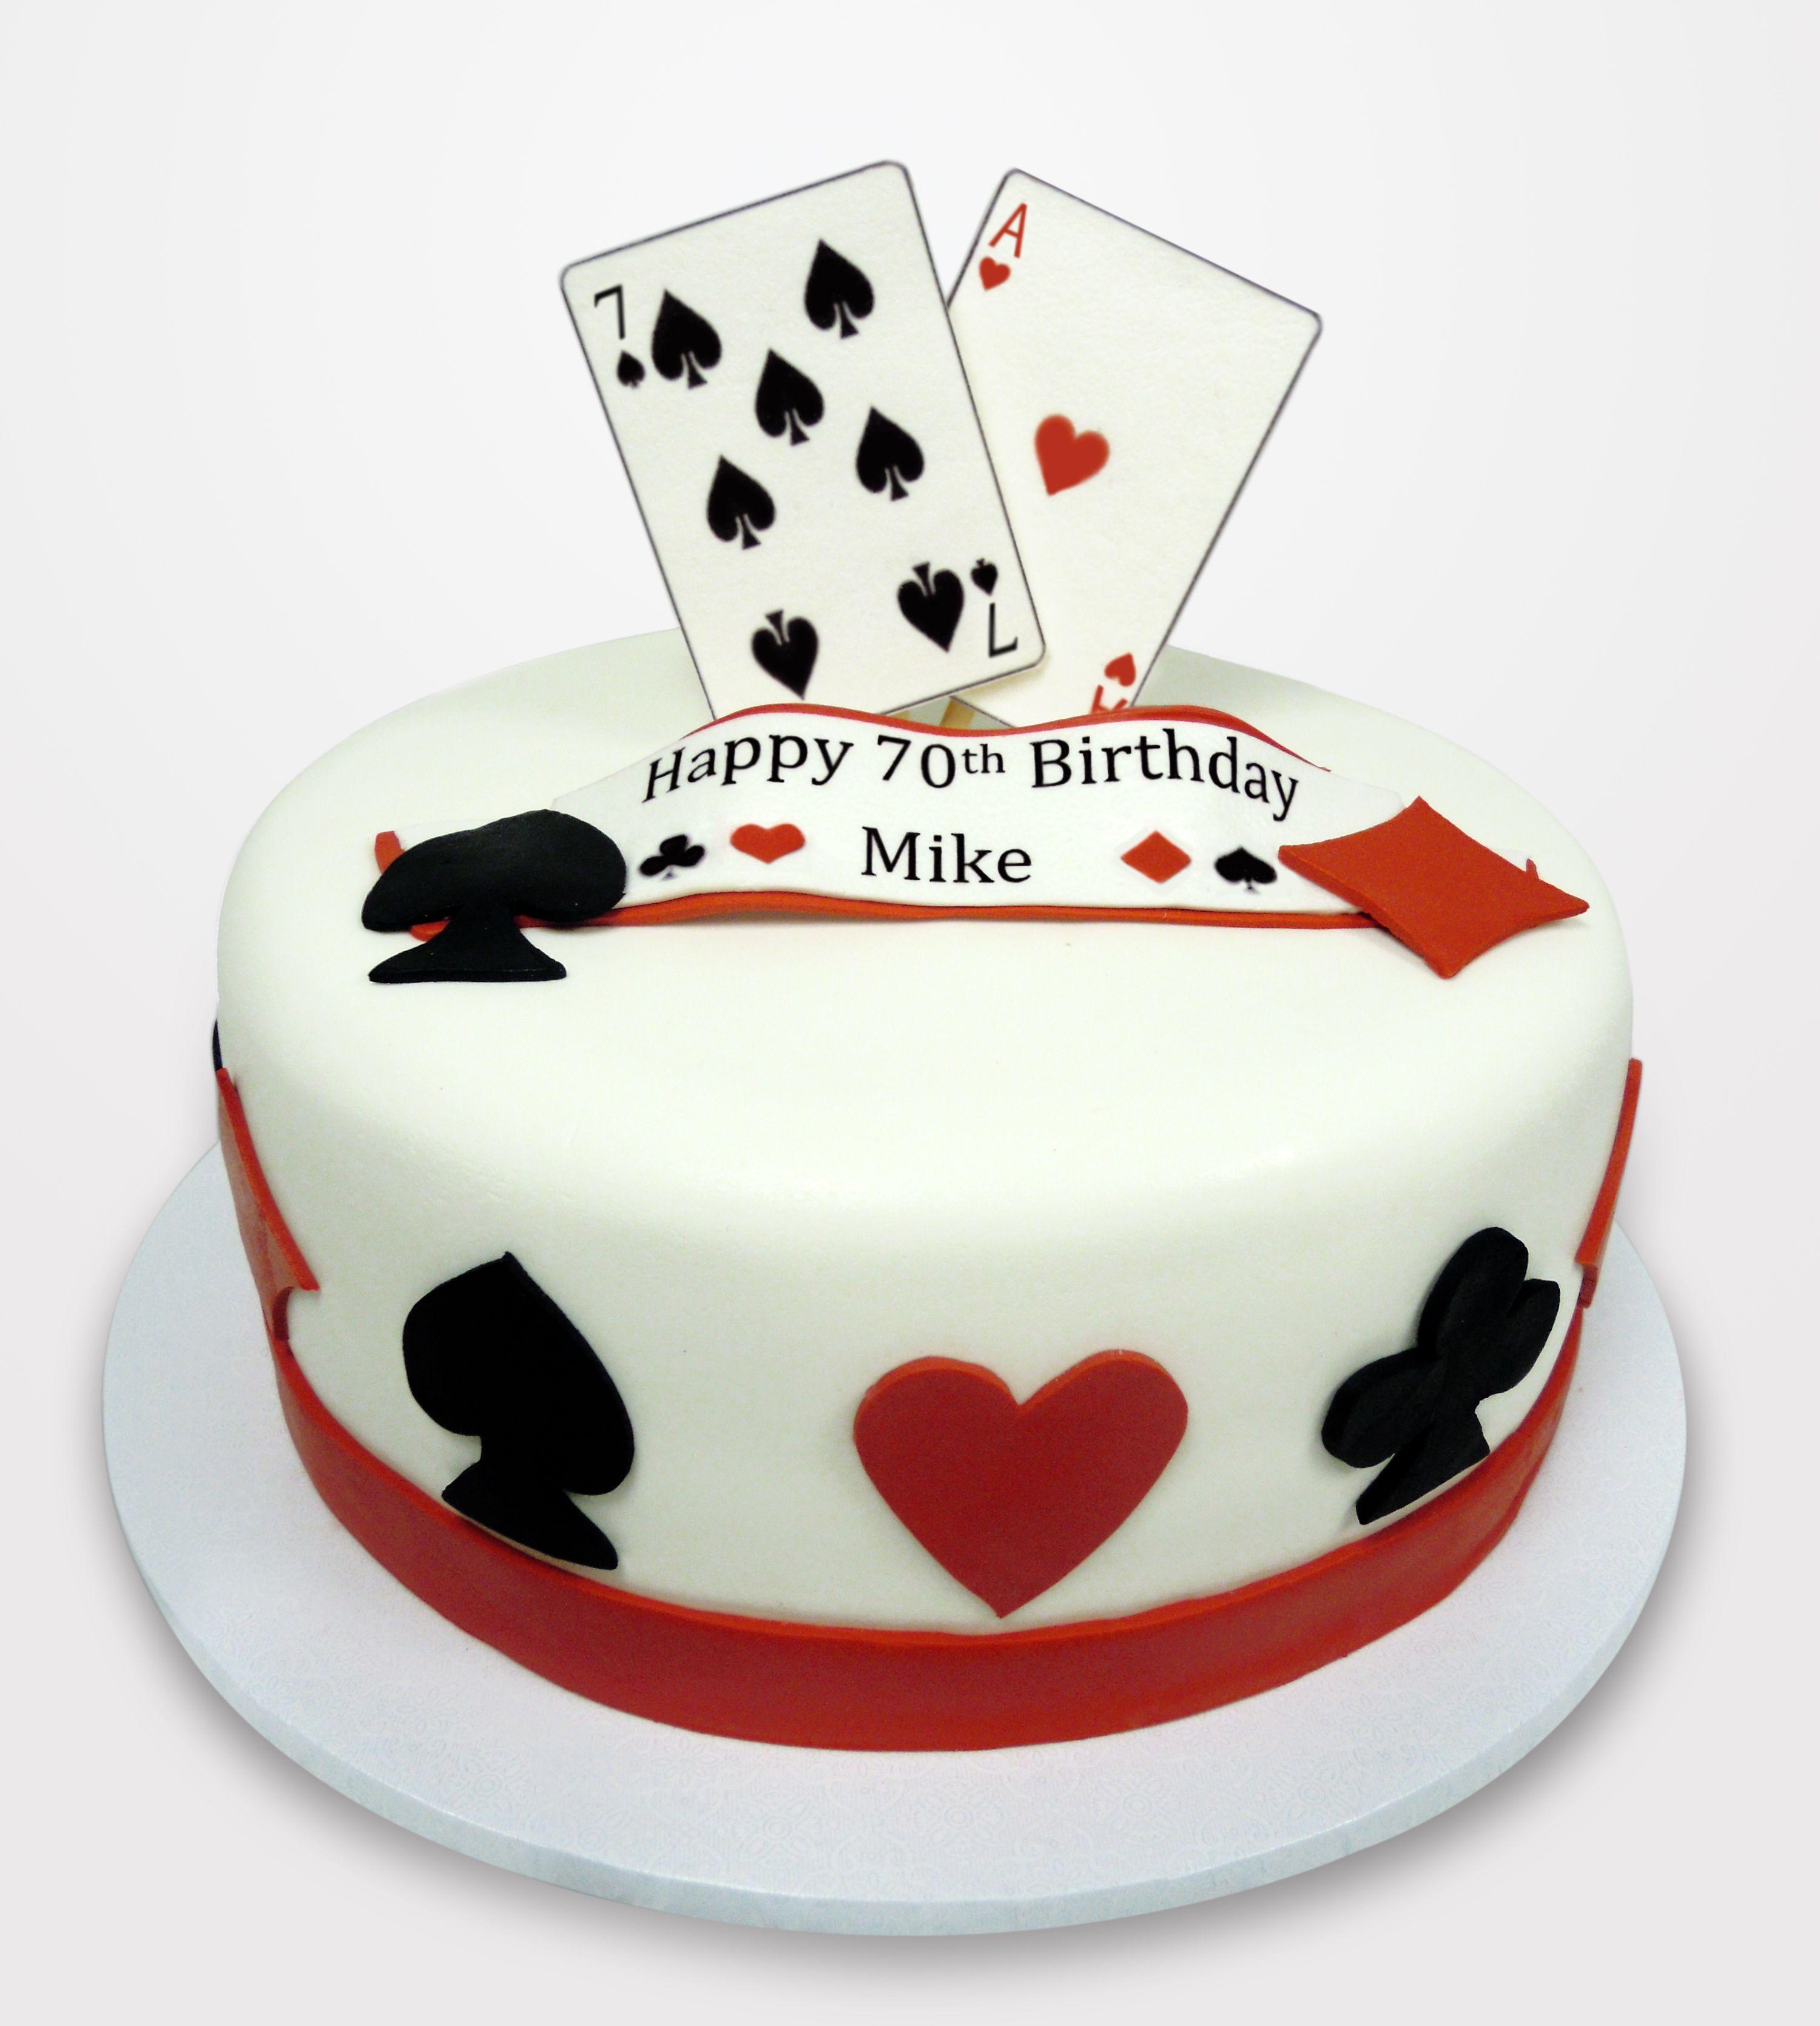 card cake Google Search Cakes Pinterest Poker cake Las